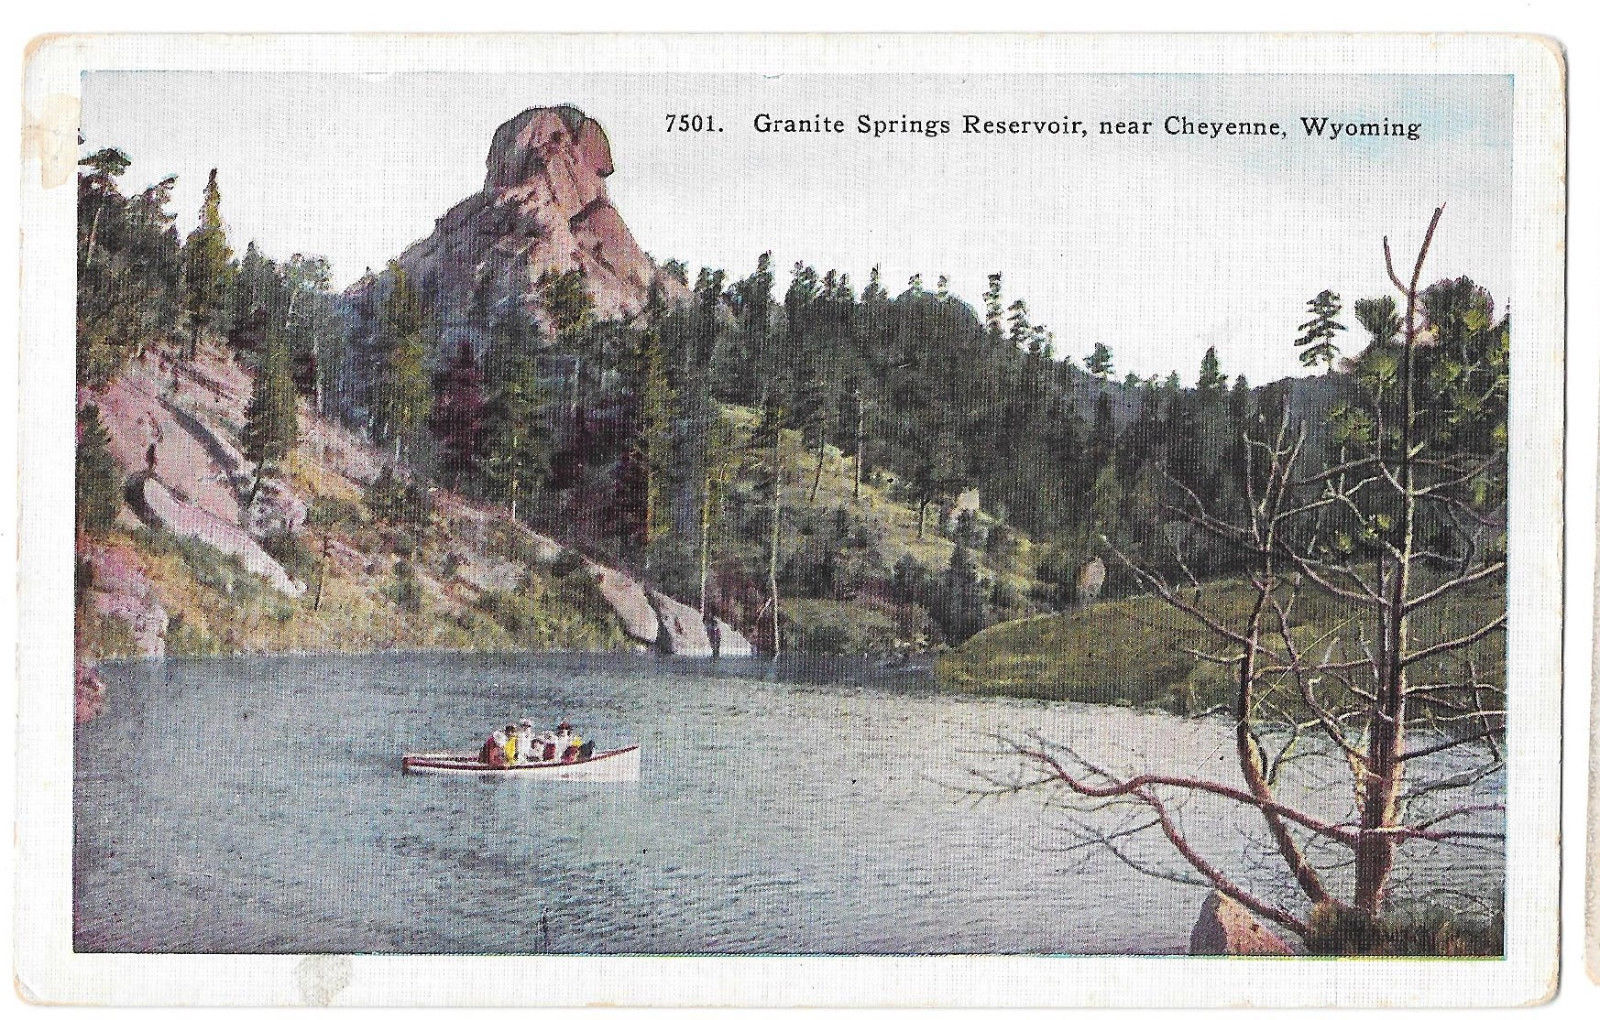 WY Cheyenne Granite Springs Reservoir Boat Vtg H H Tammen Postcard Wyoming